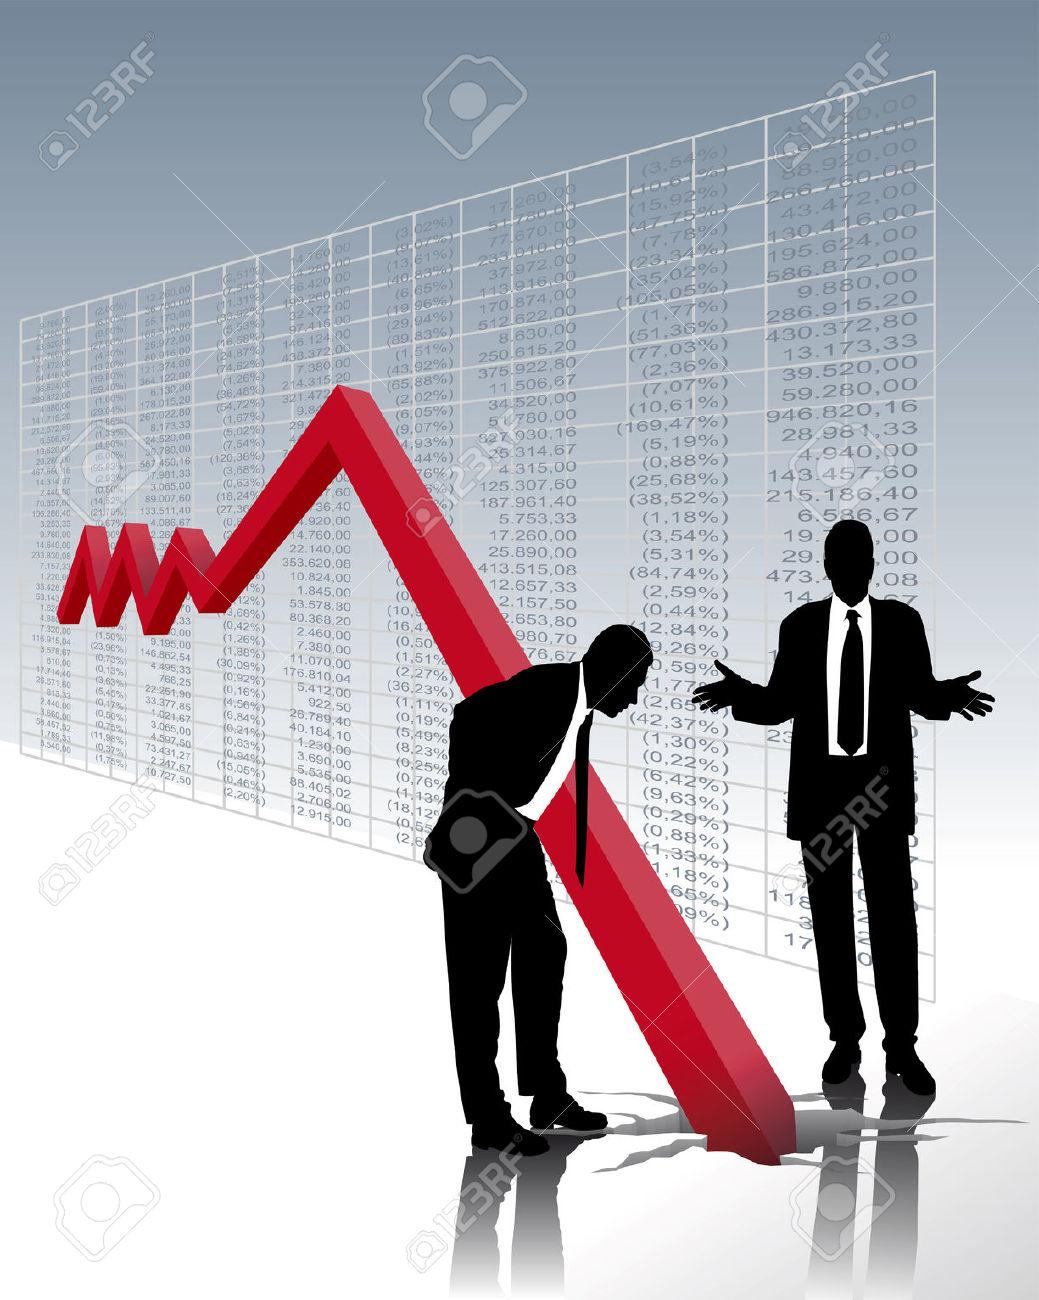 Stock Market Crash Clipart.